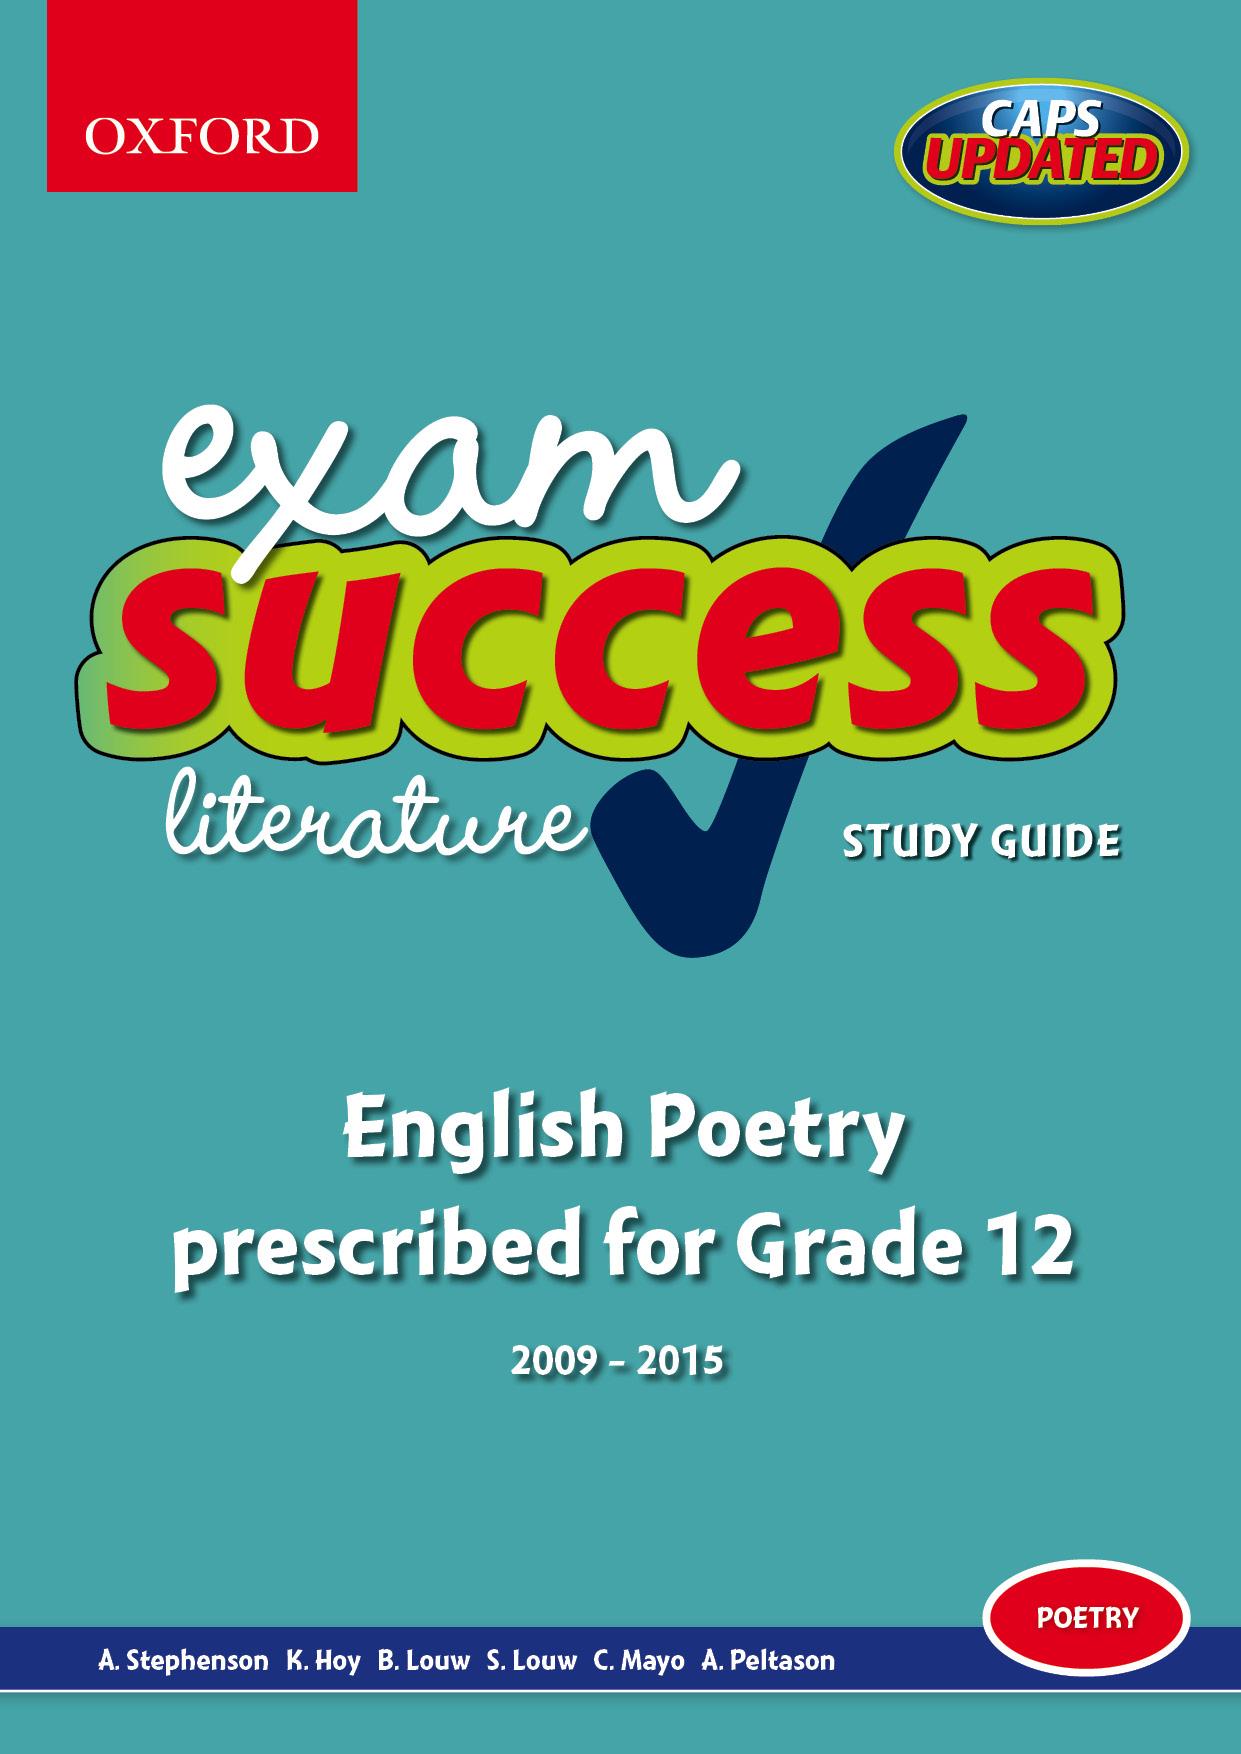 exam success literature study guide english poetry prescribed for rh wcedeportal co za Greek Mythology Study Guide Non Fiction Study Guide